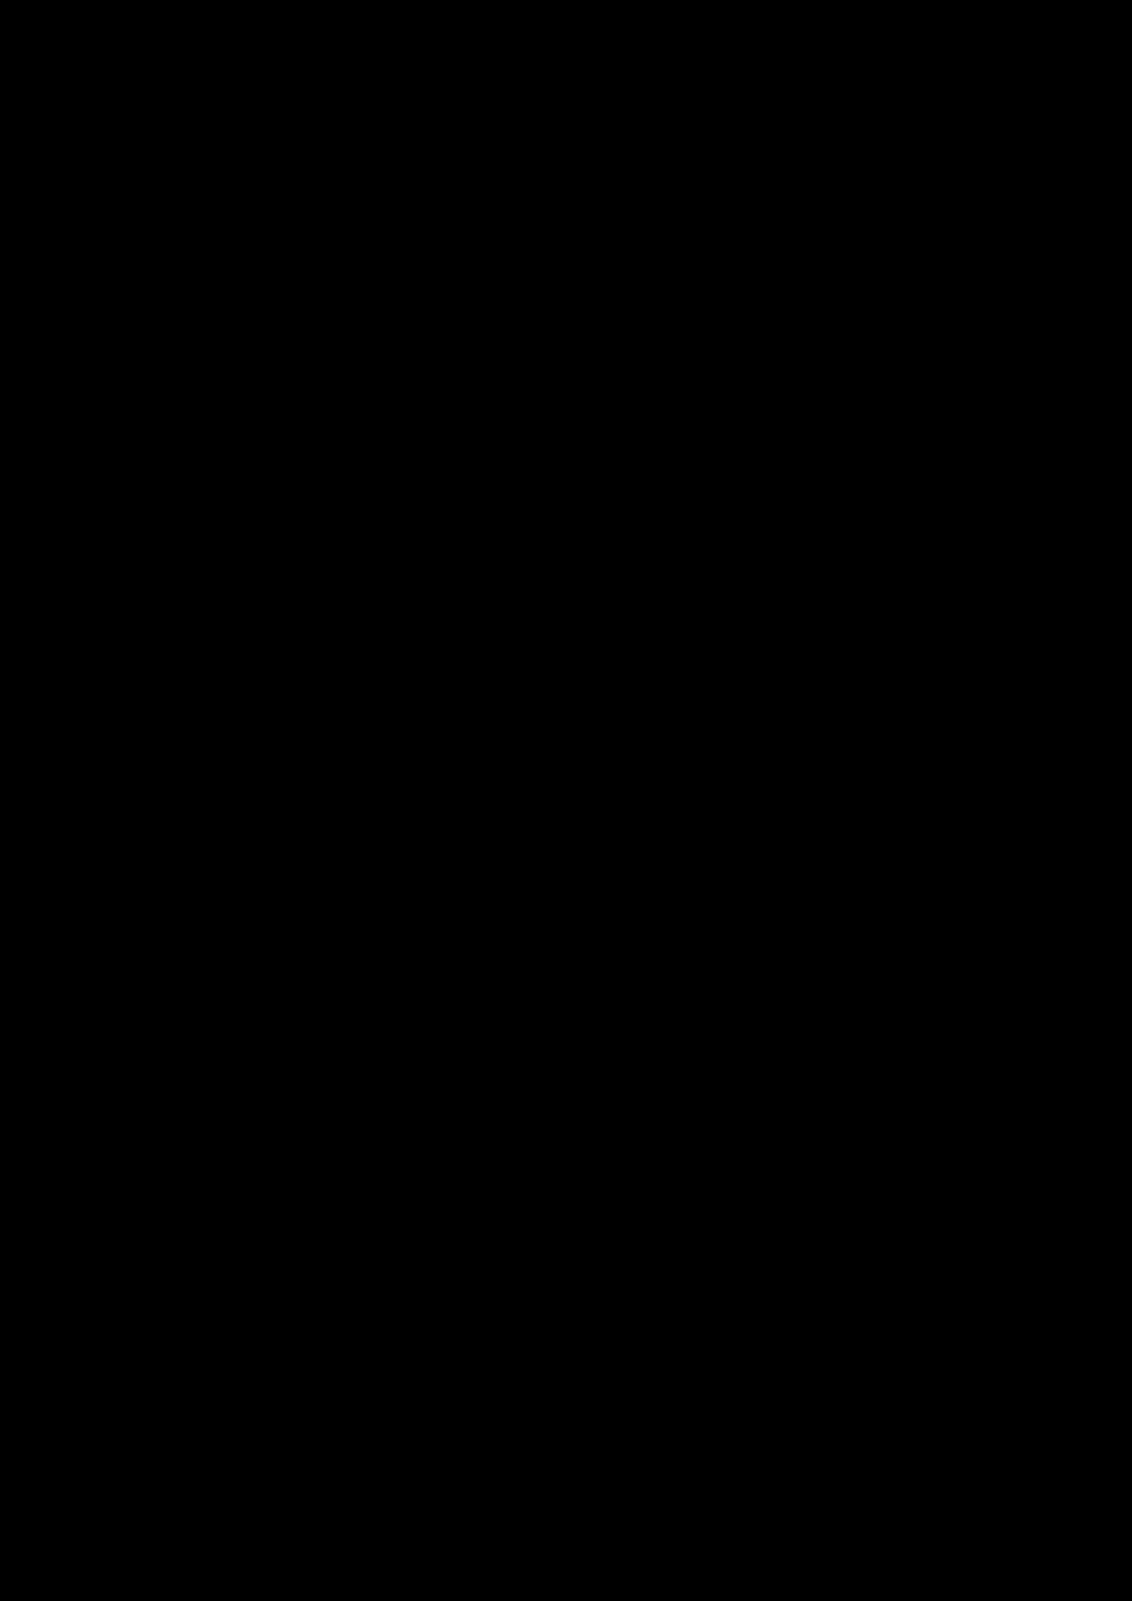 Prosti slide, Image 23